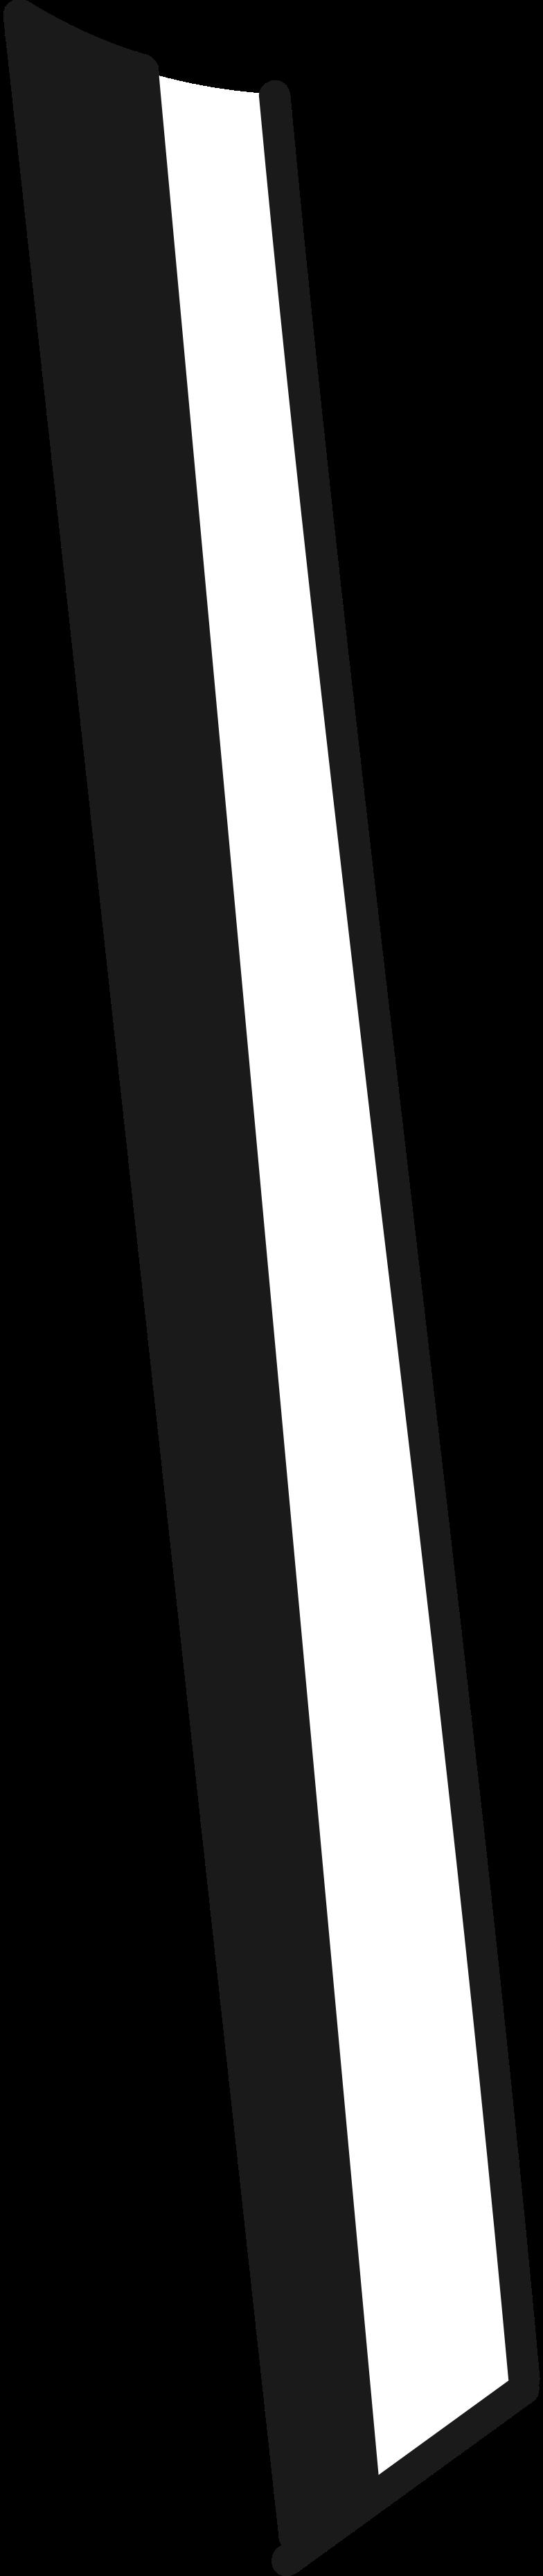 scythe lower part Clipart illustration in PNG, SVG